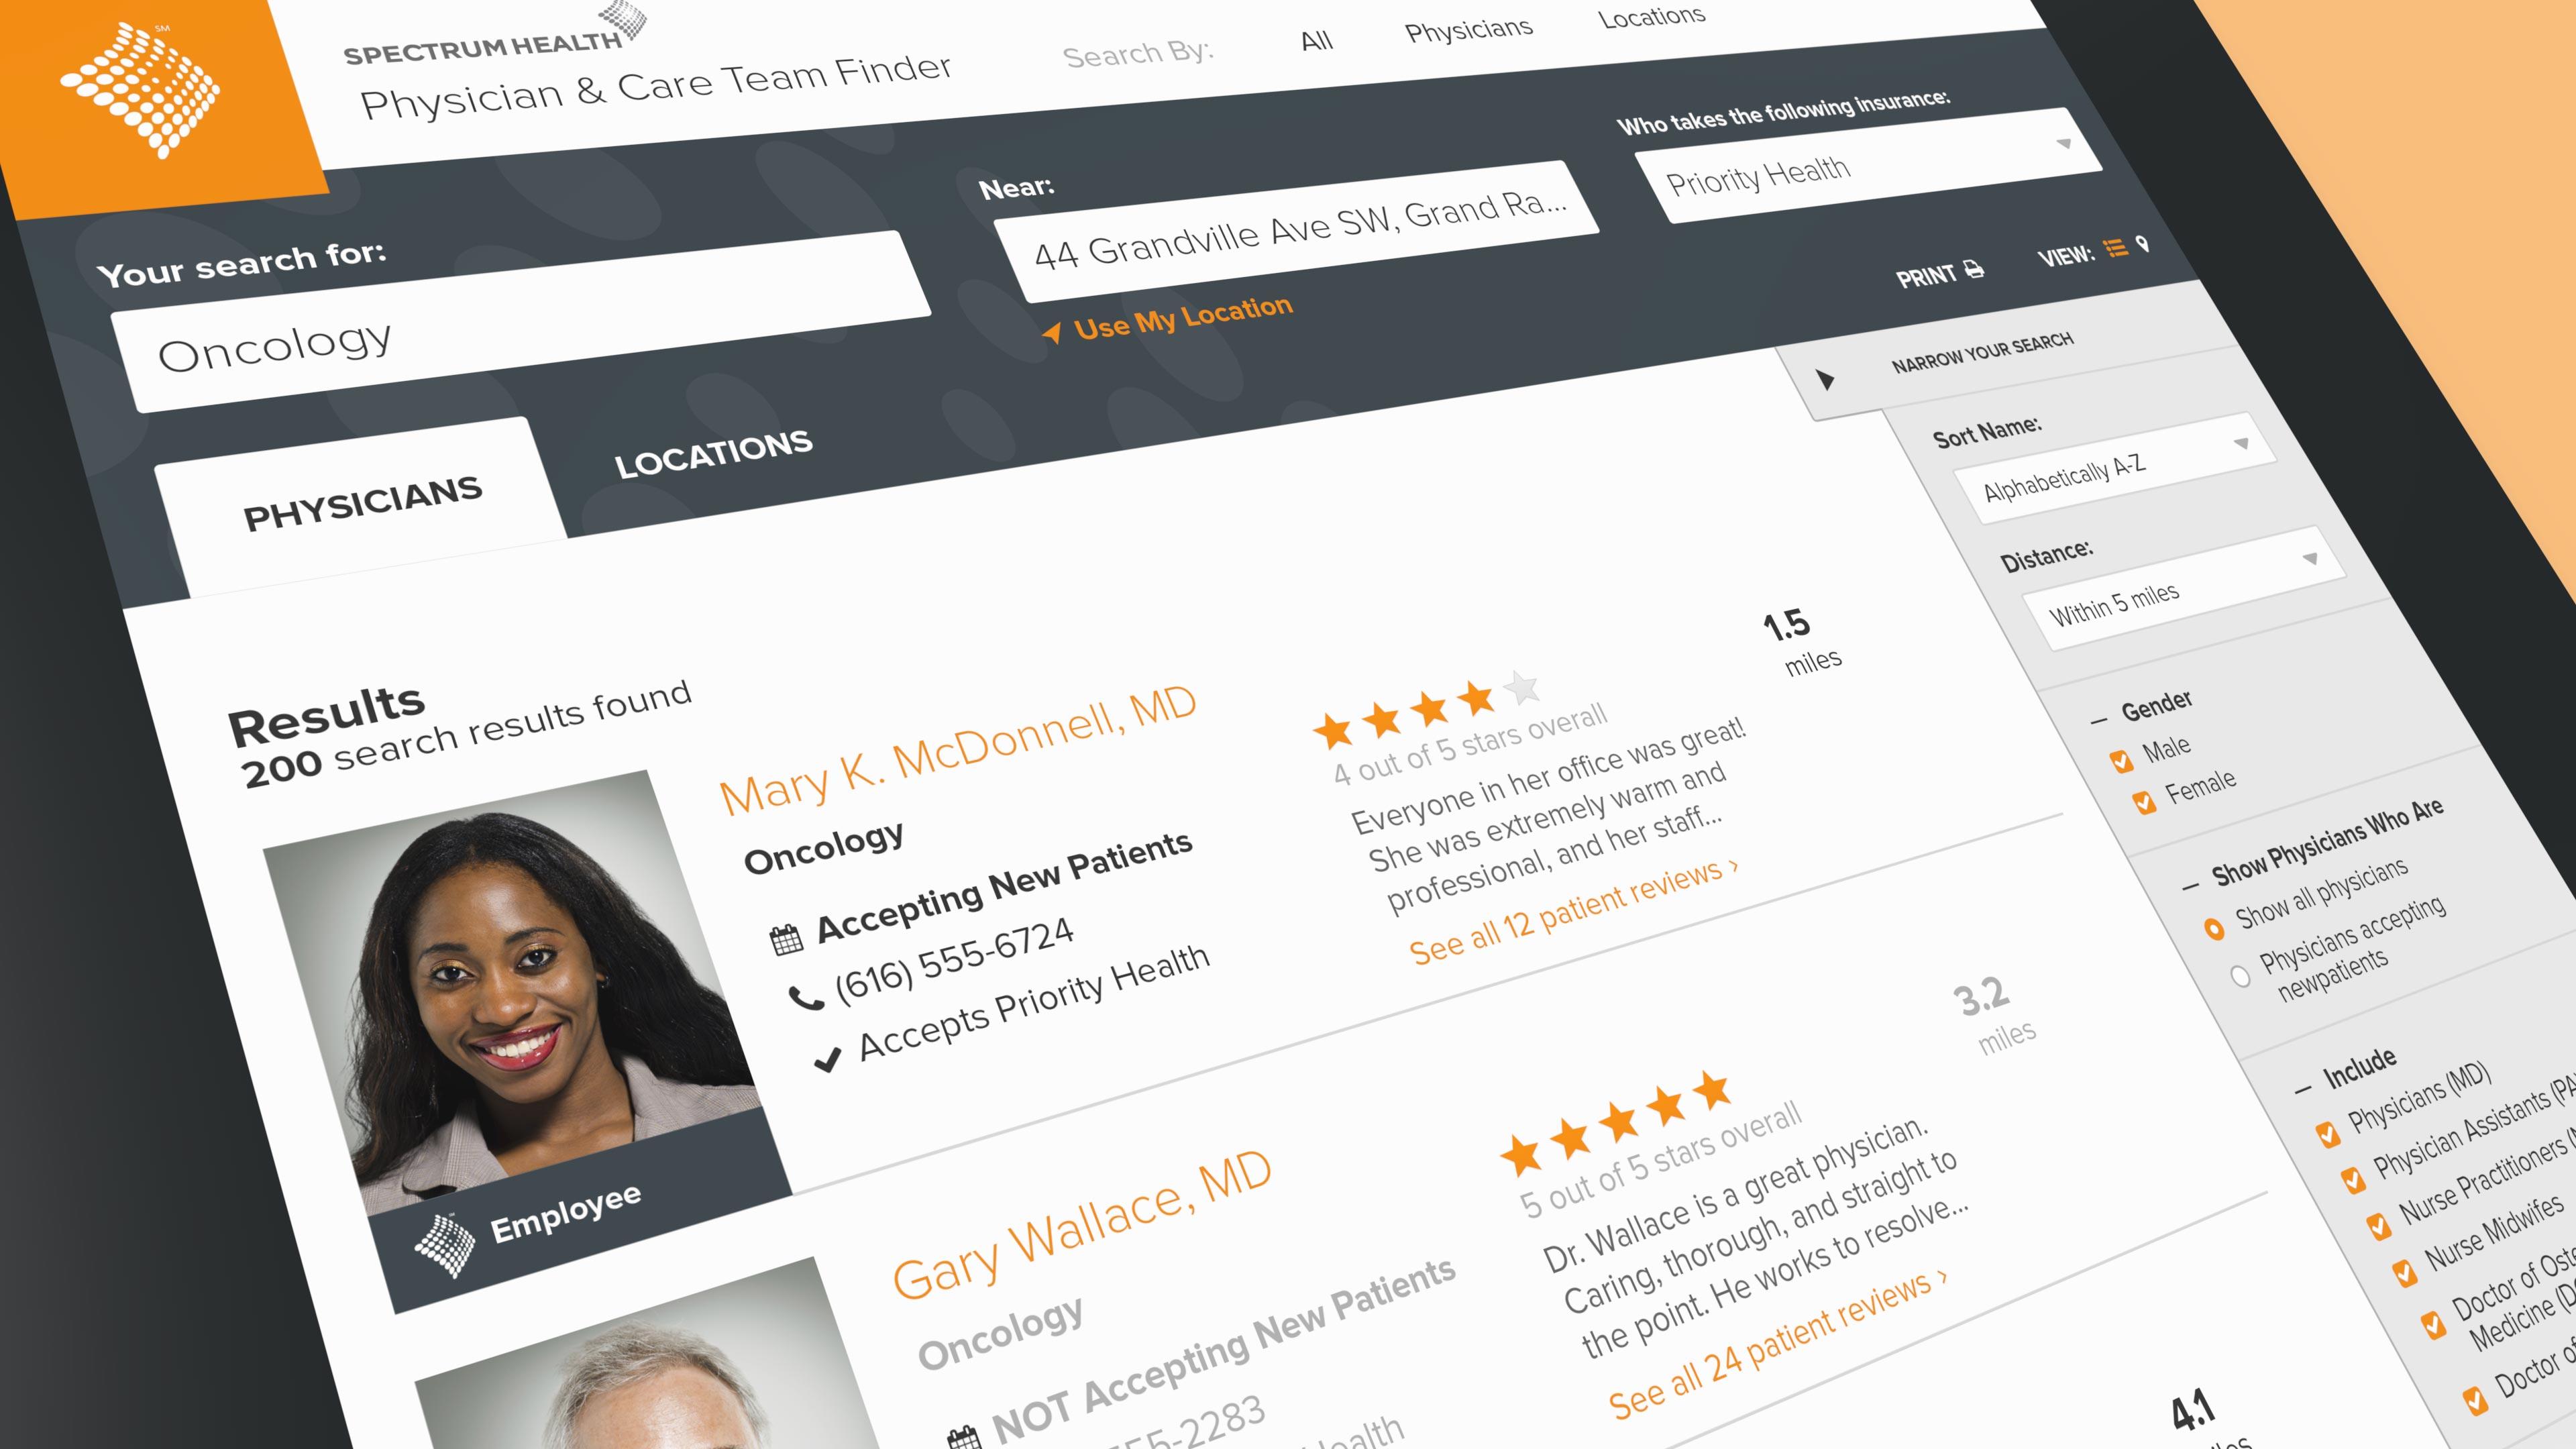 Screenshot of the Physician Finder website